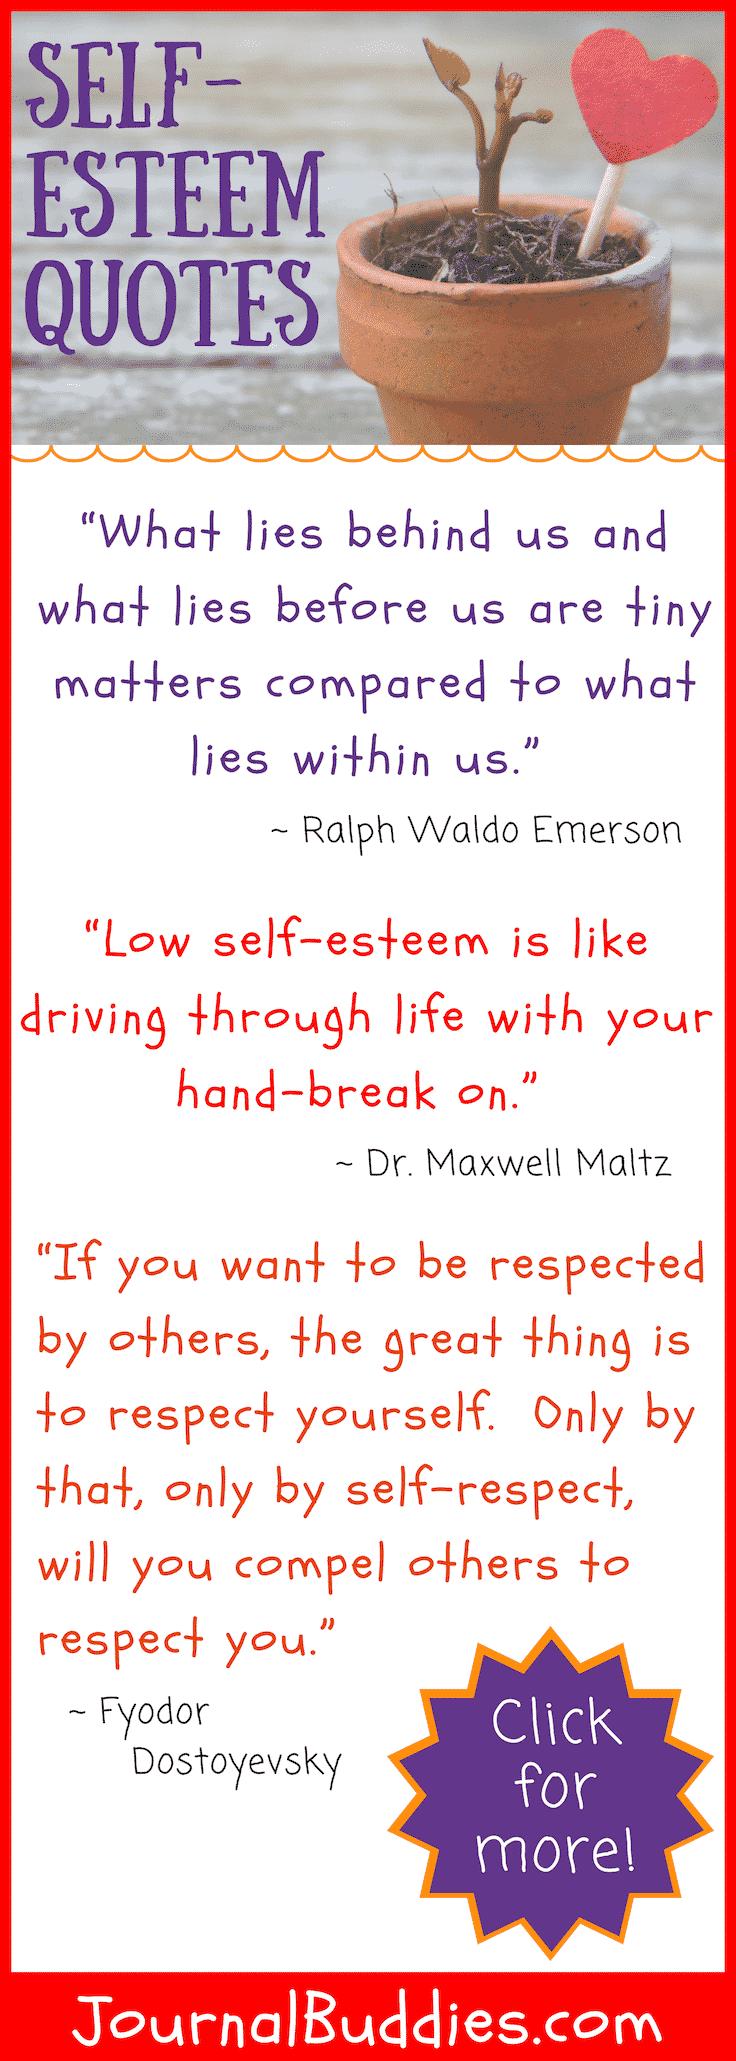 Self Esteem Quotes Journalbuddiescom